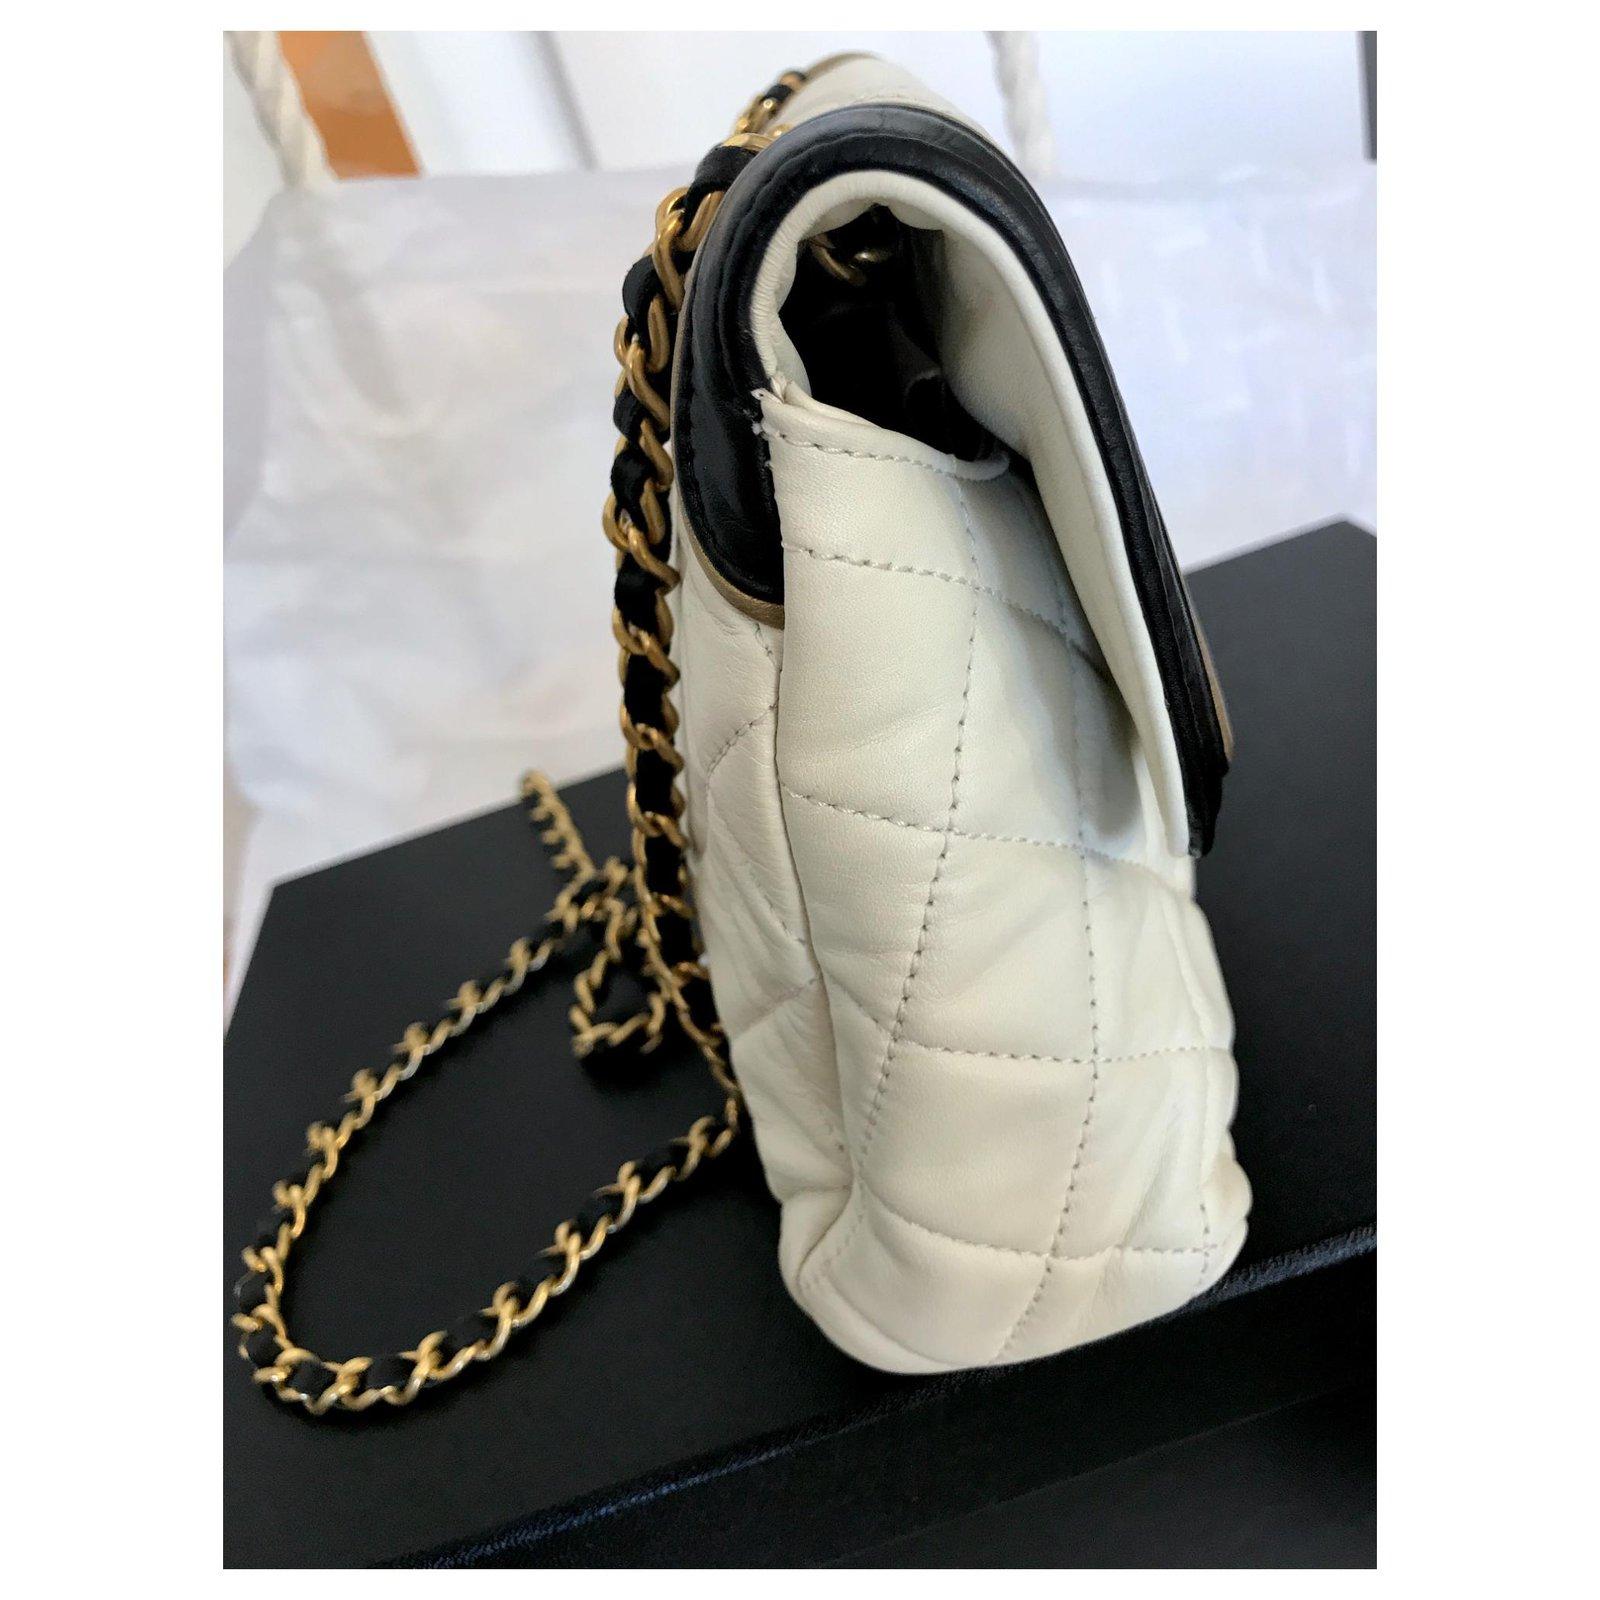 c38ab0ad7225 Chanel Crossbody shoulder flap bag Handbags Leather Beige,Cream ref.122133  - Joli Closet